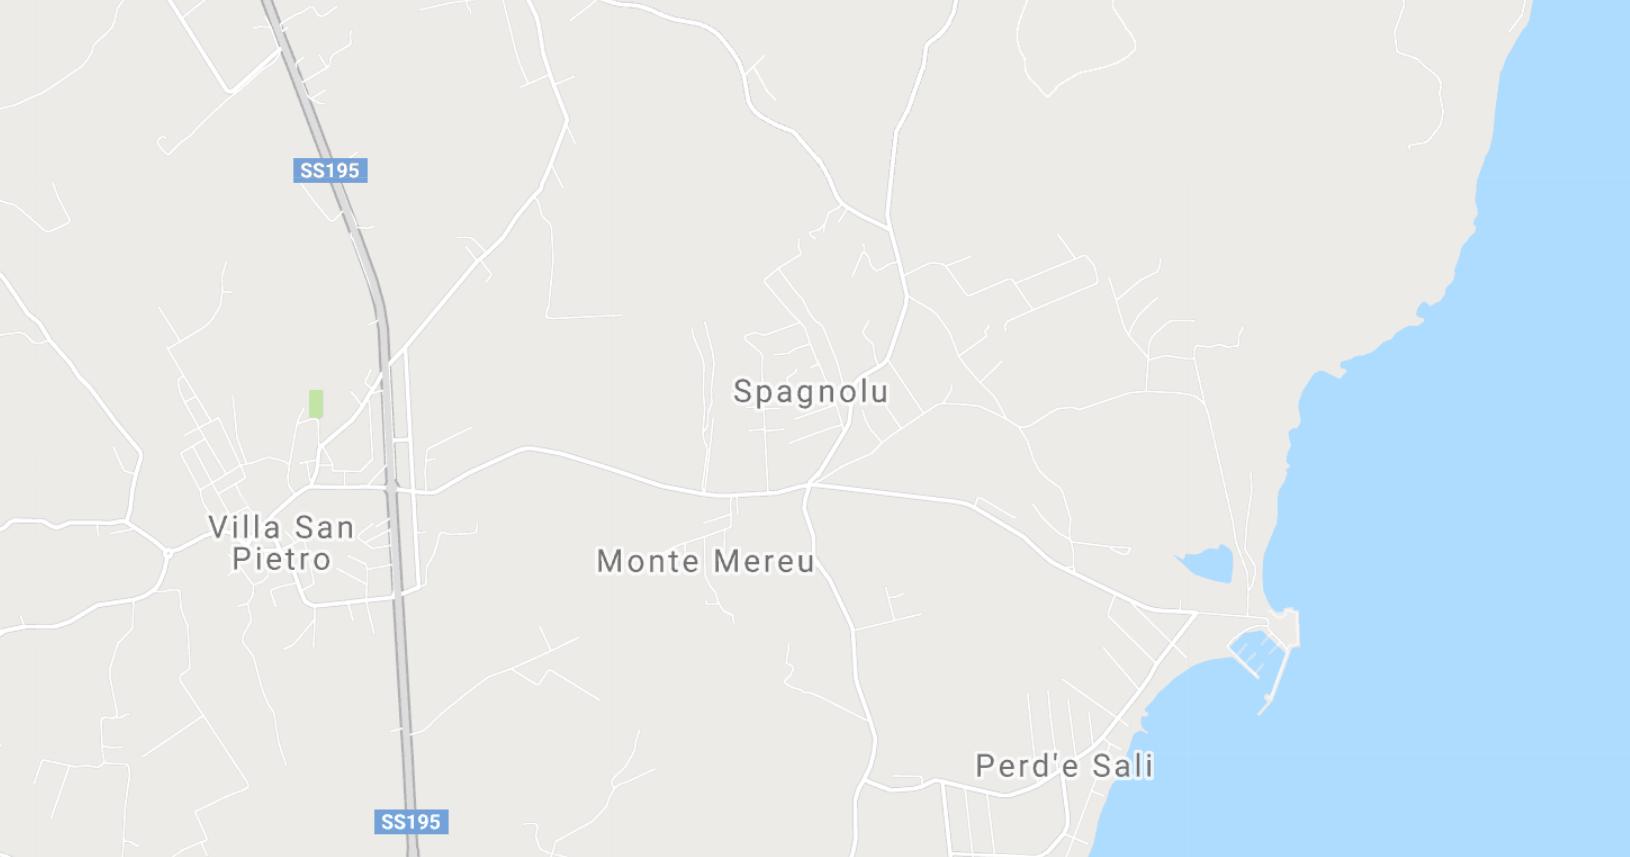 mappa spagnolu3